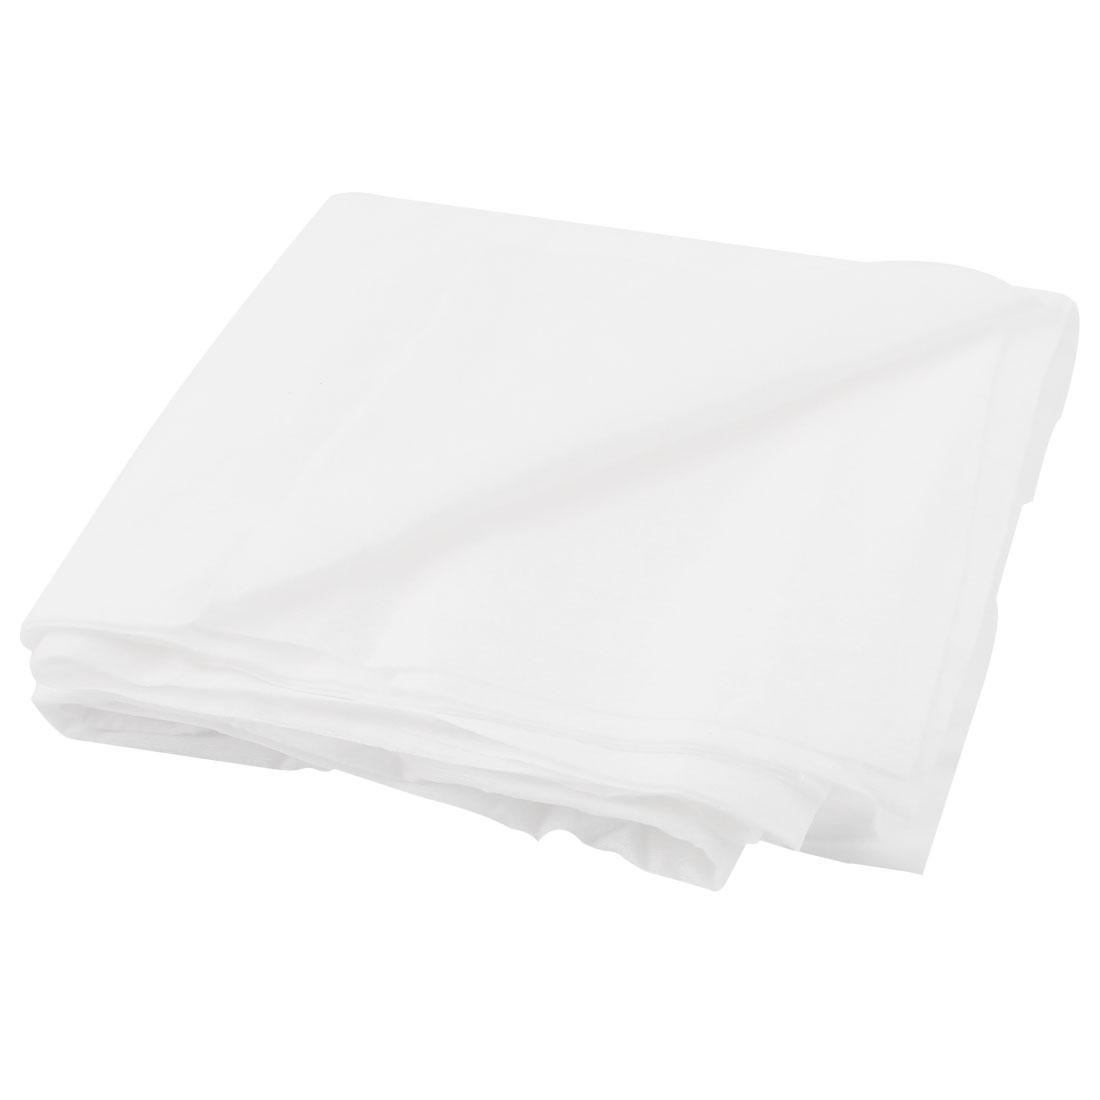 Home Hotel Non-woven Fabrics Rectangle Towel Sheet White 138cm x 77cm